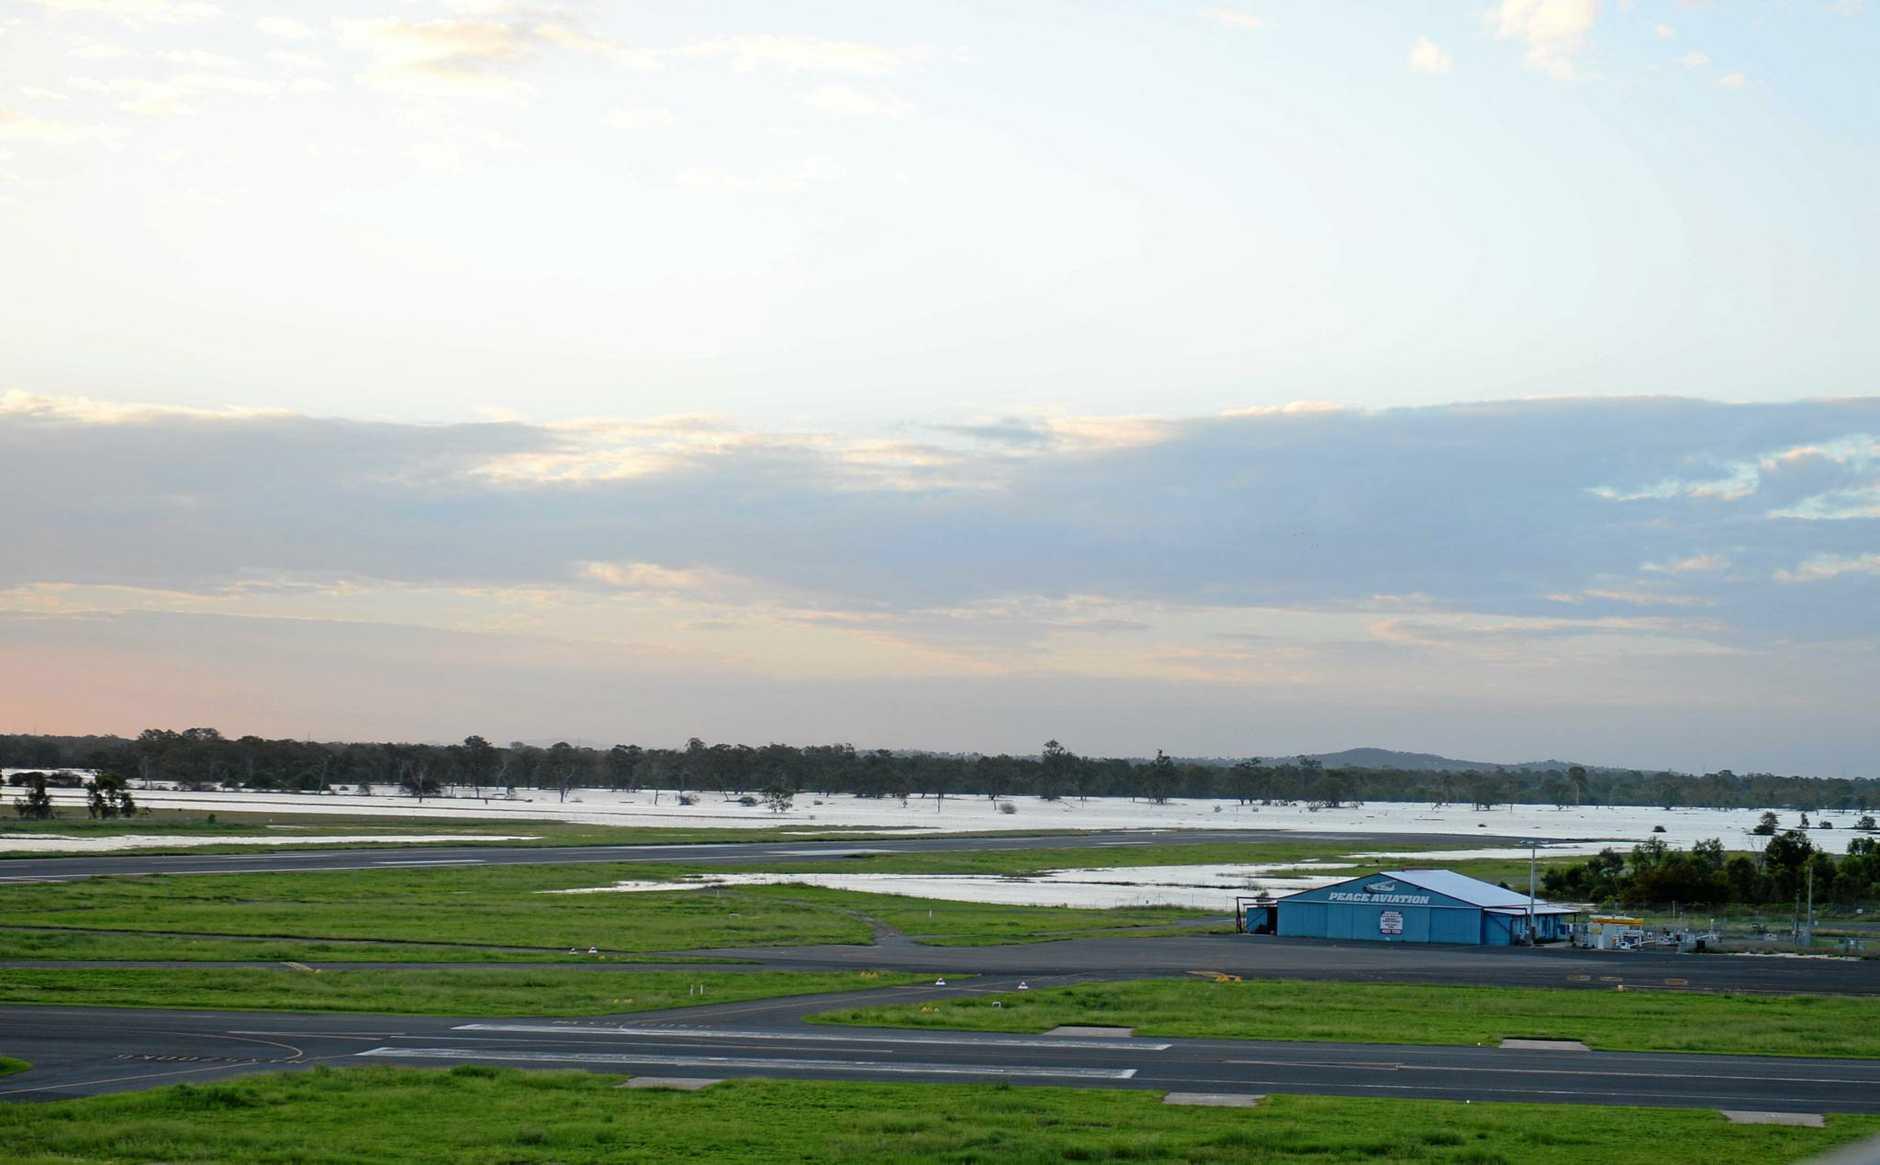 Northern end of runway at Rockhampton airport.